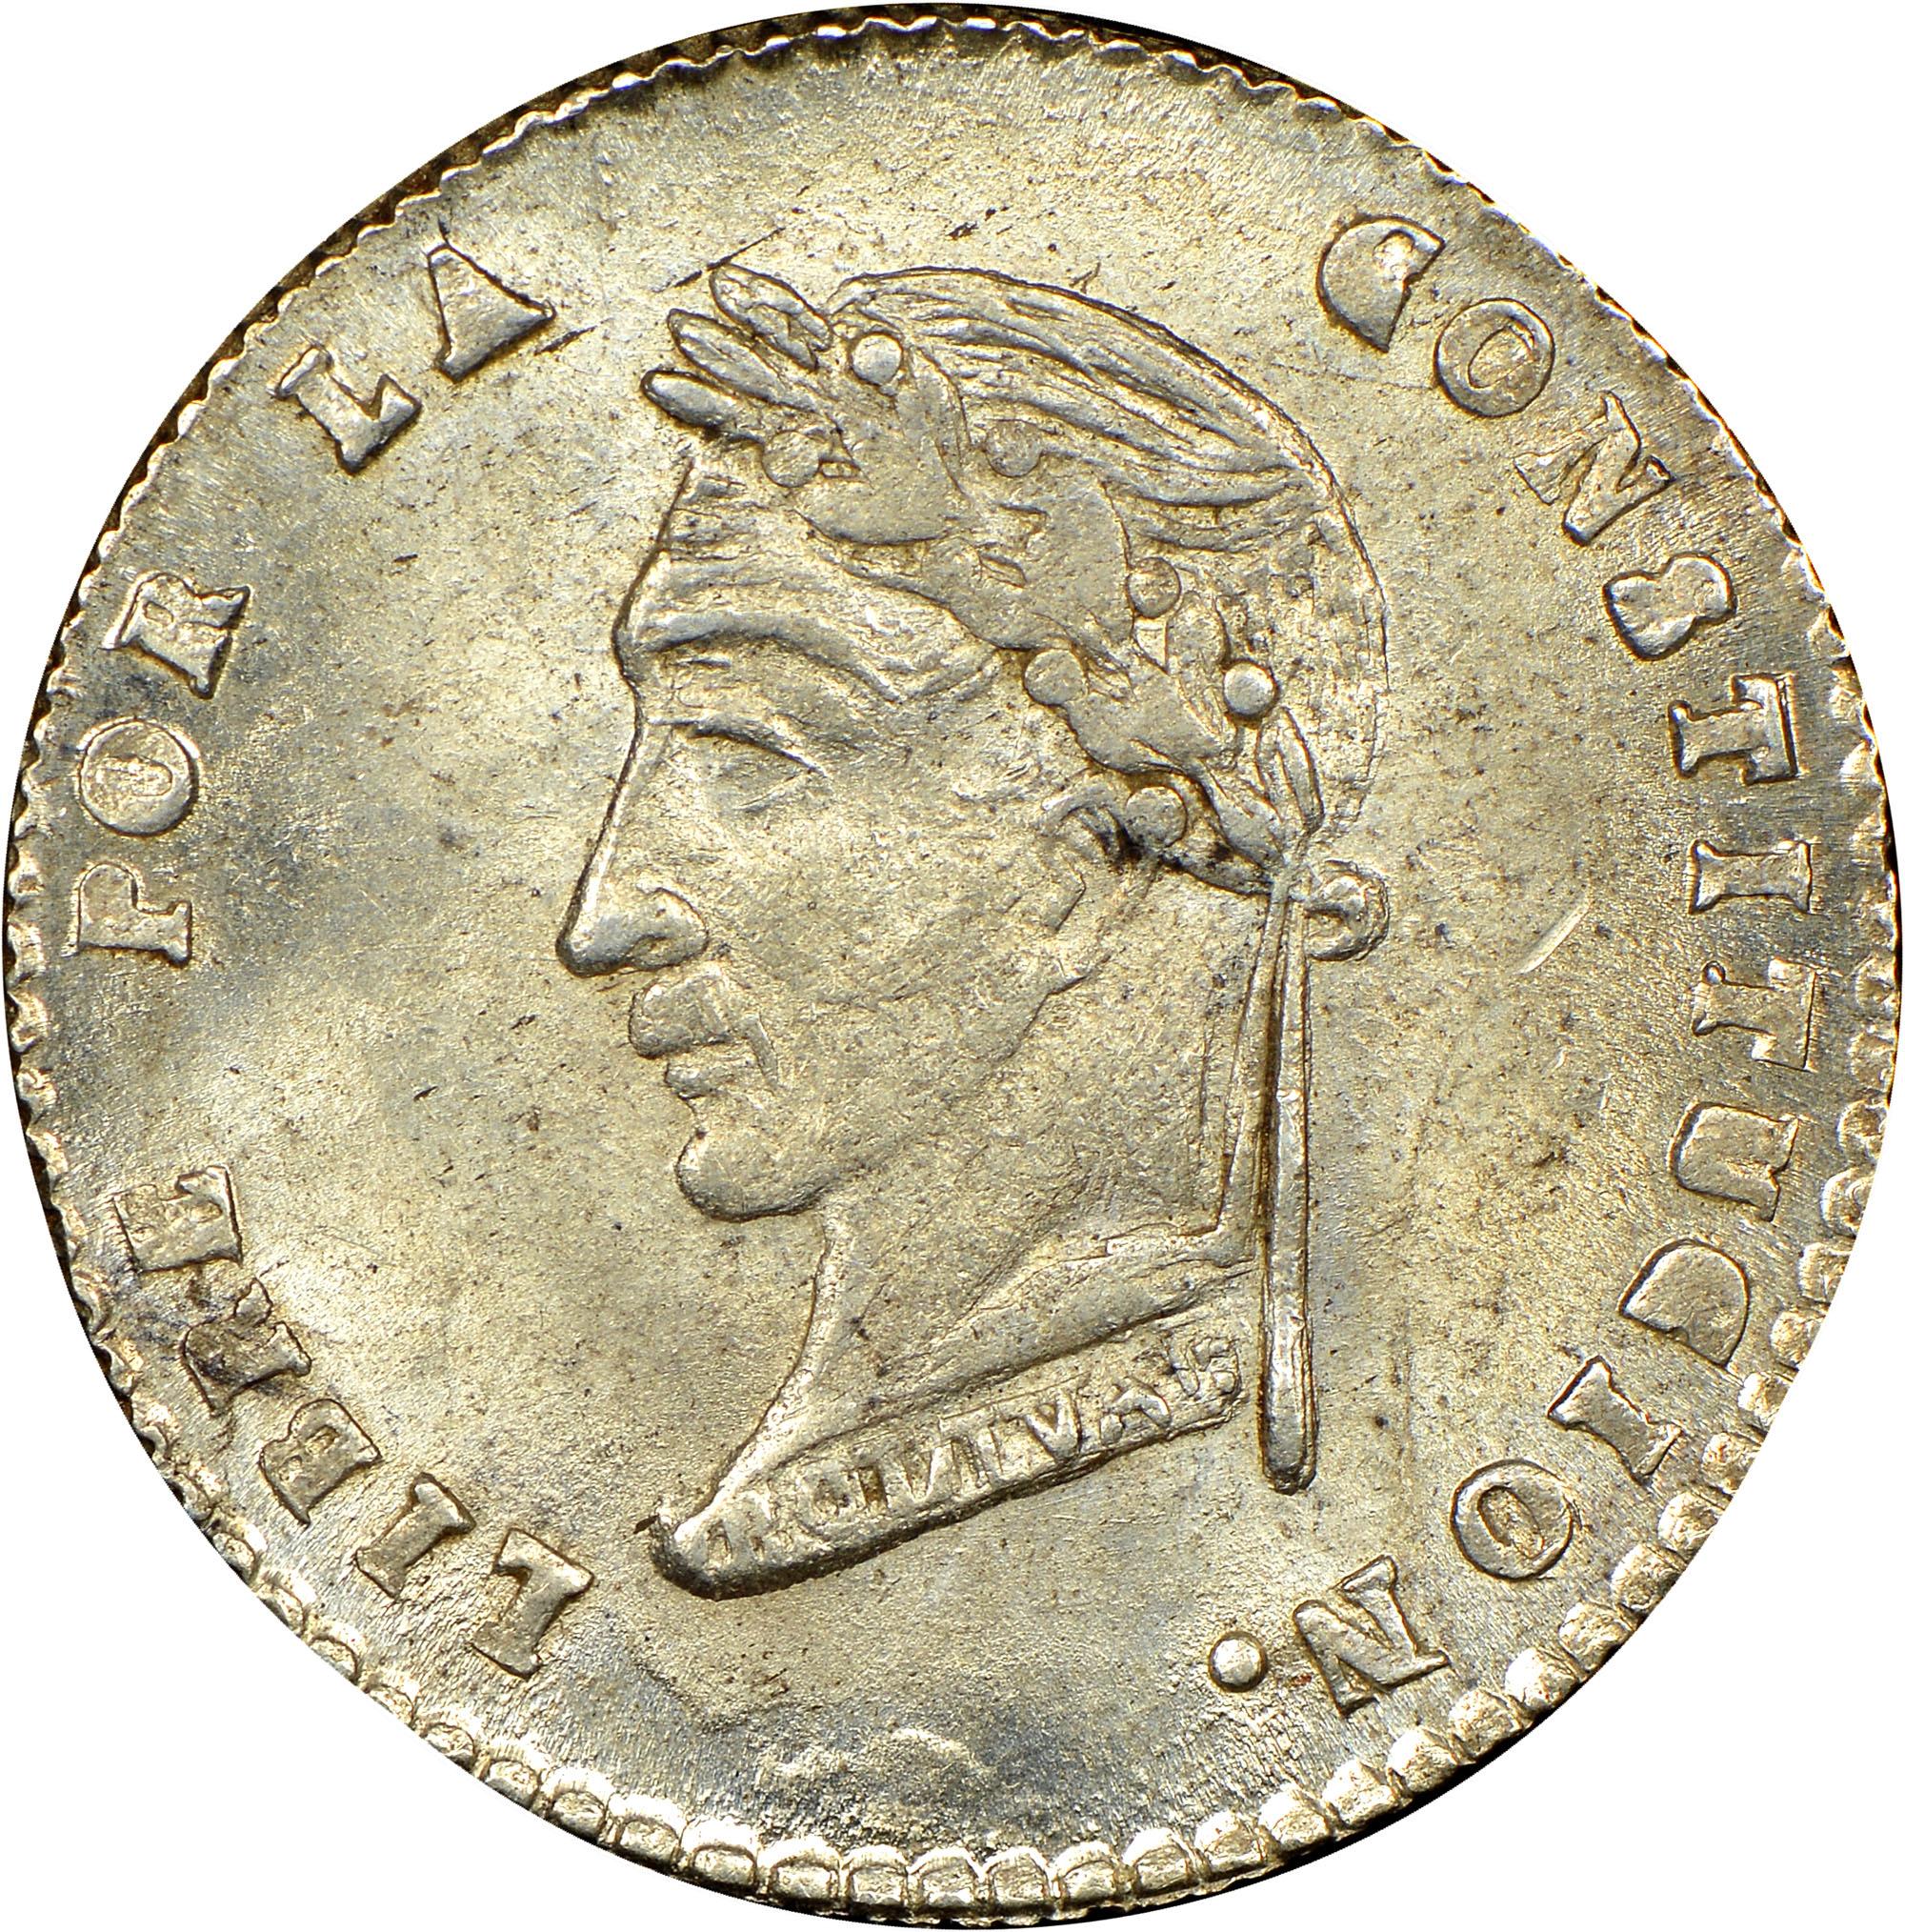 1857-1859/7 Bolivia Sol reverse